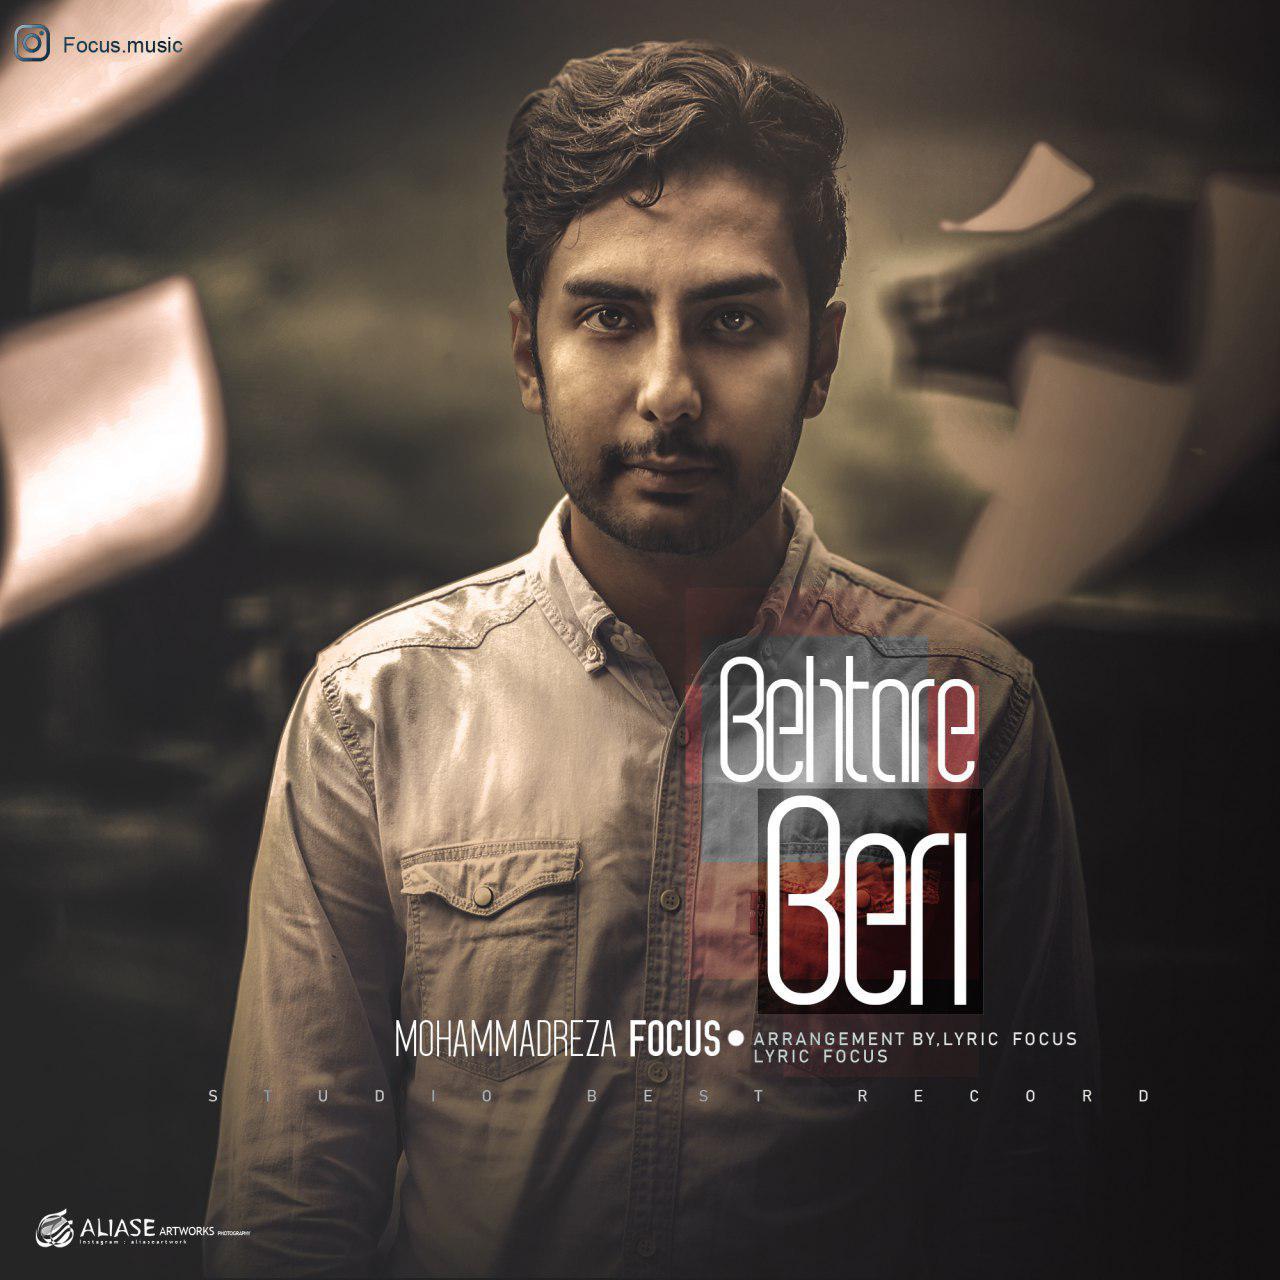 Mohammadreza Focus – Behtare Beri